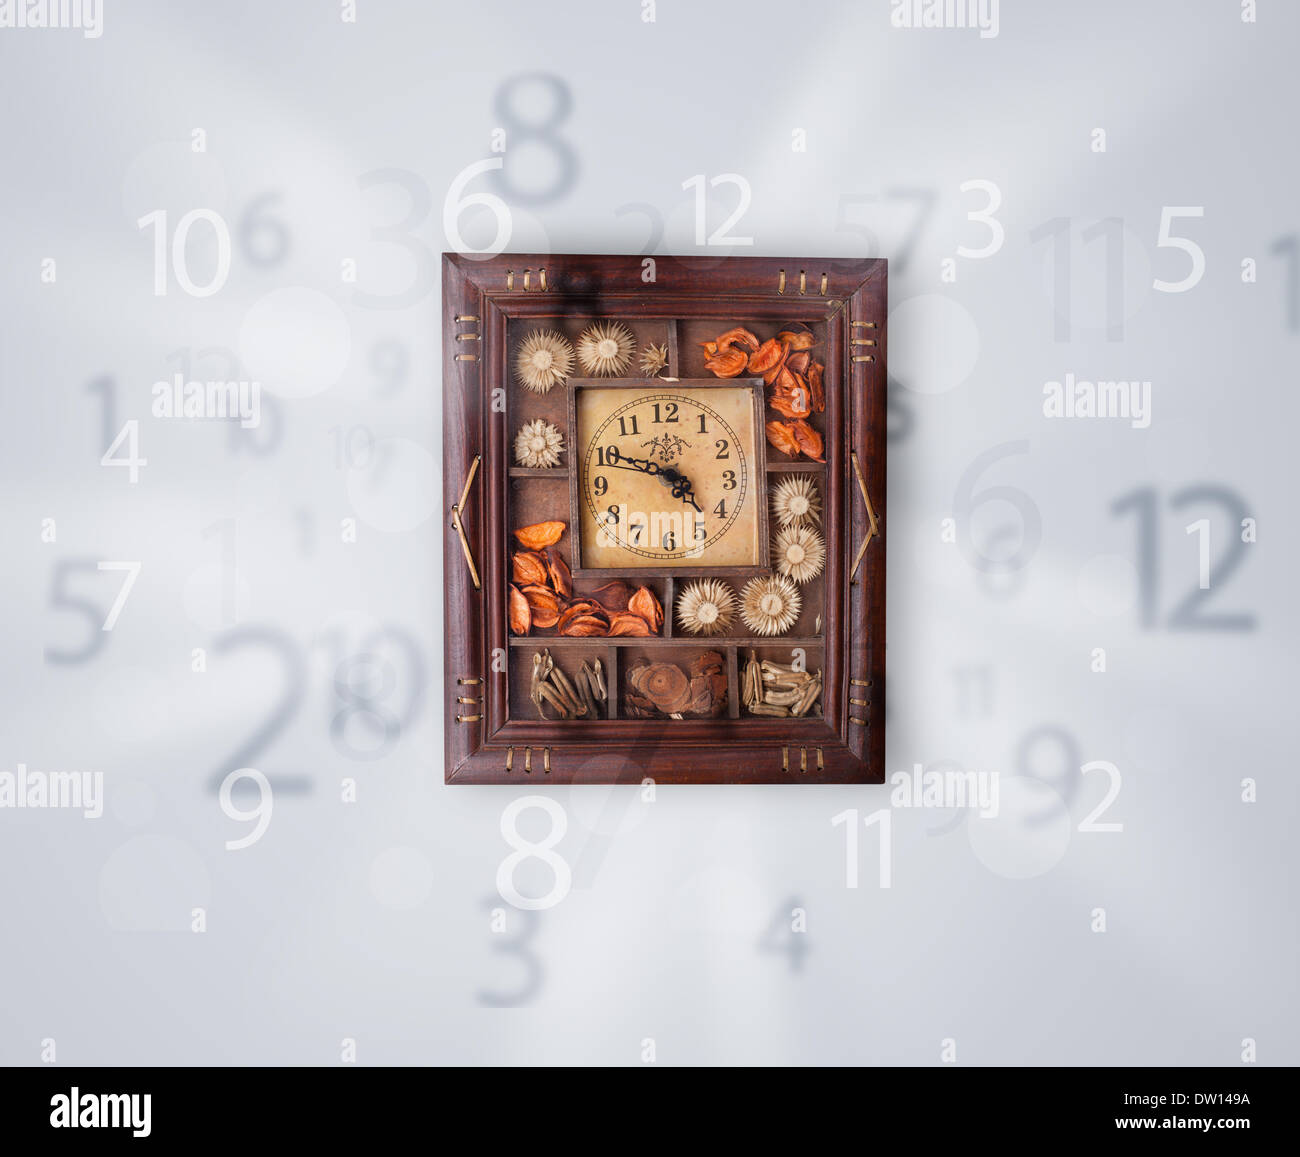 Digital Clock Numbers Stock Photos & Digital Clock Numbers